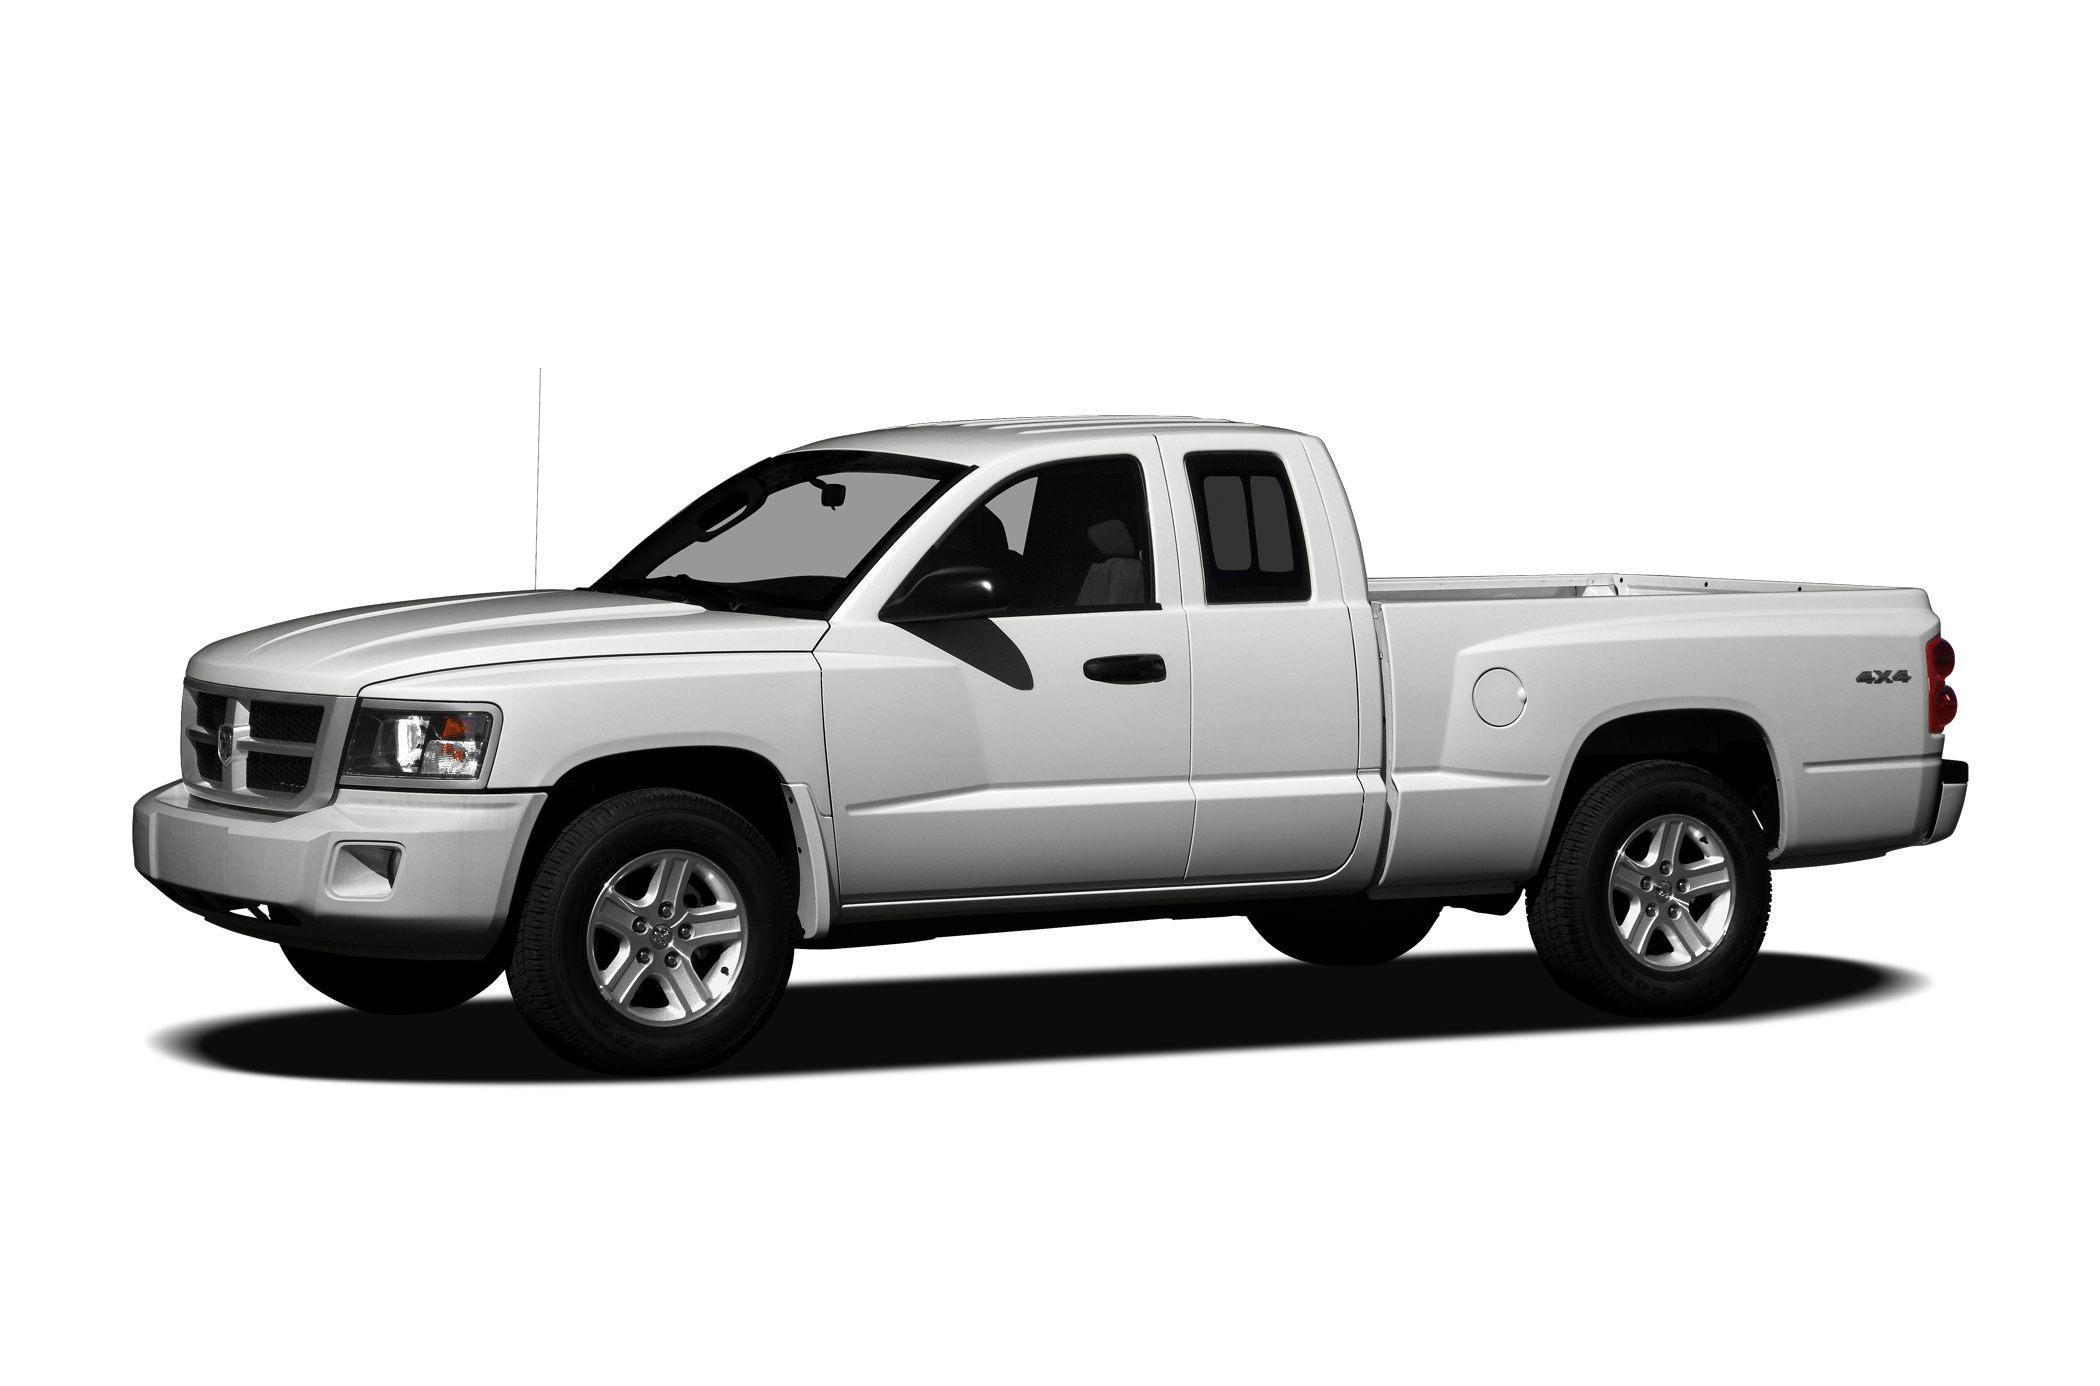 Dodge Dakota News, Photos and Buying Information - Autoblog